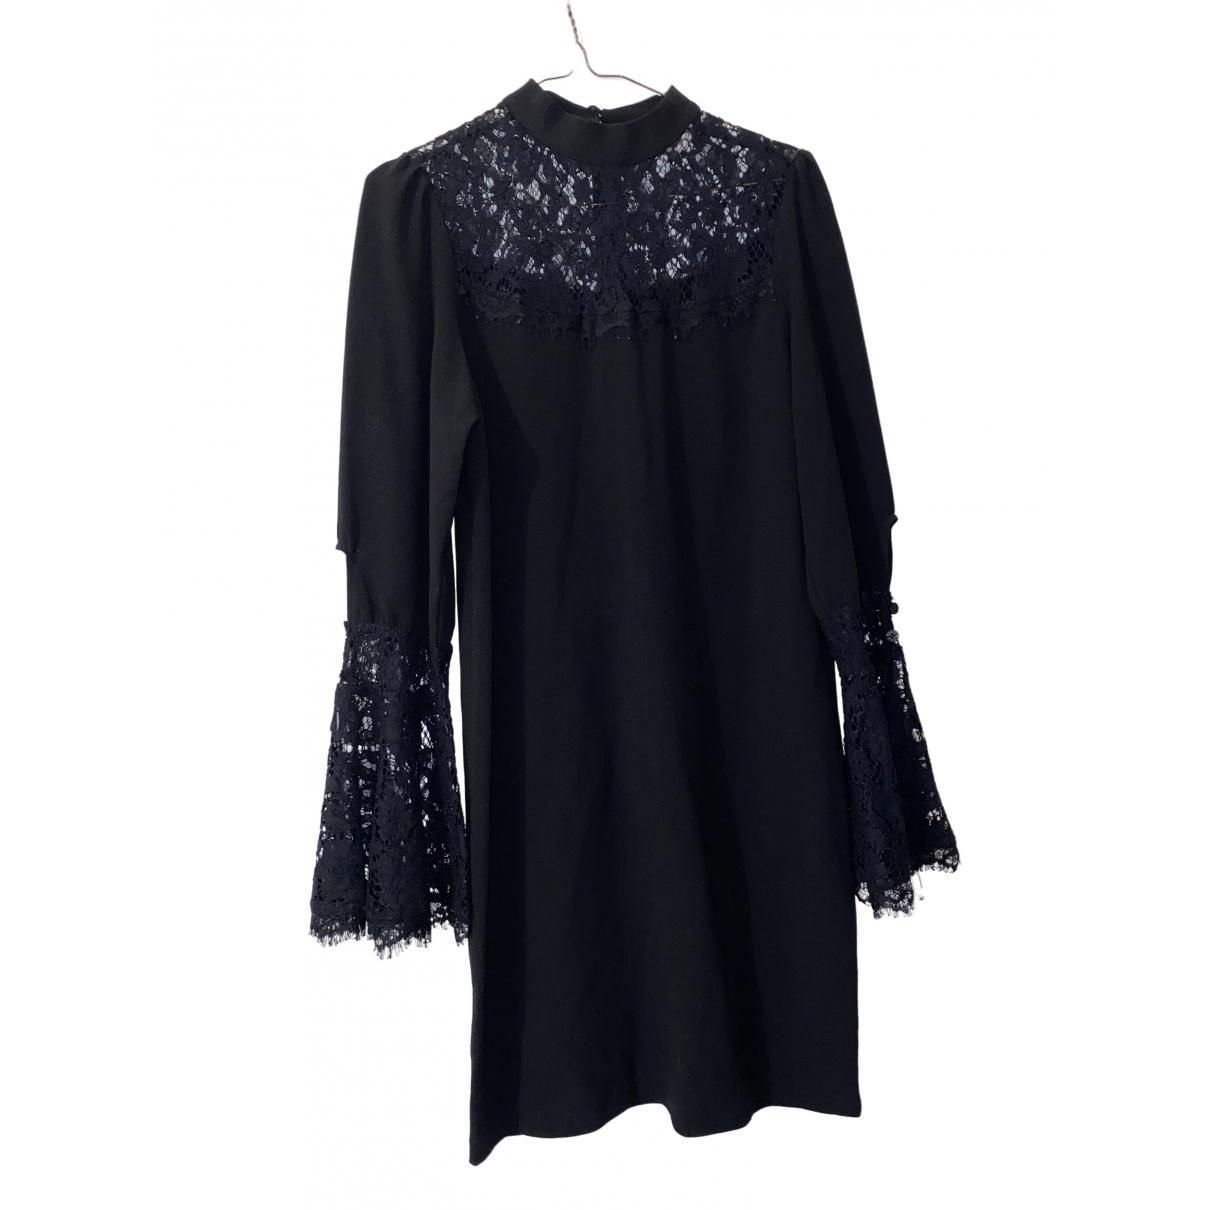 Bel Air \N Black Cotton - elasthane dress for Women 38 FR